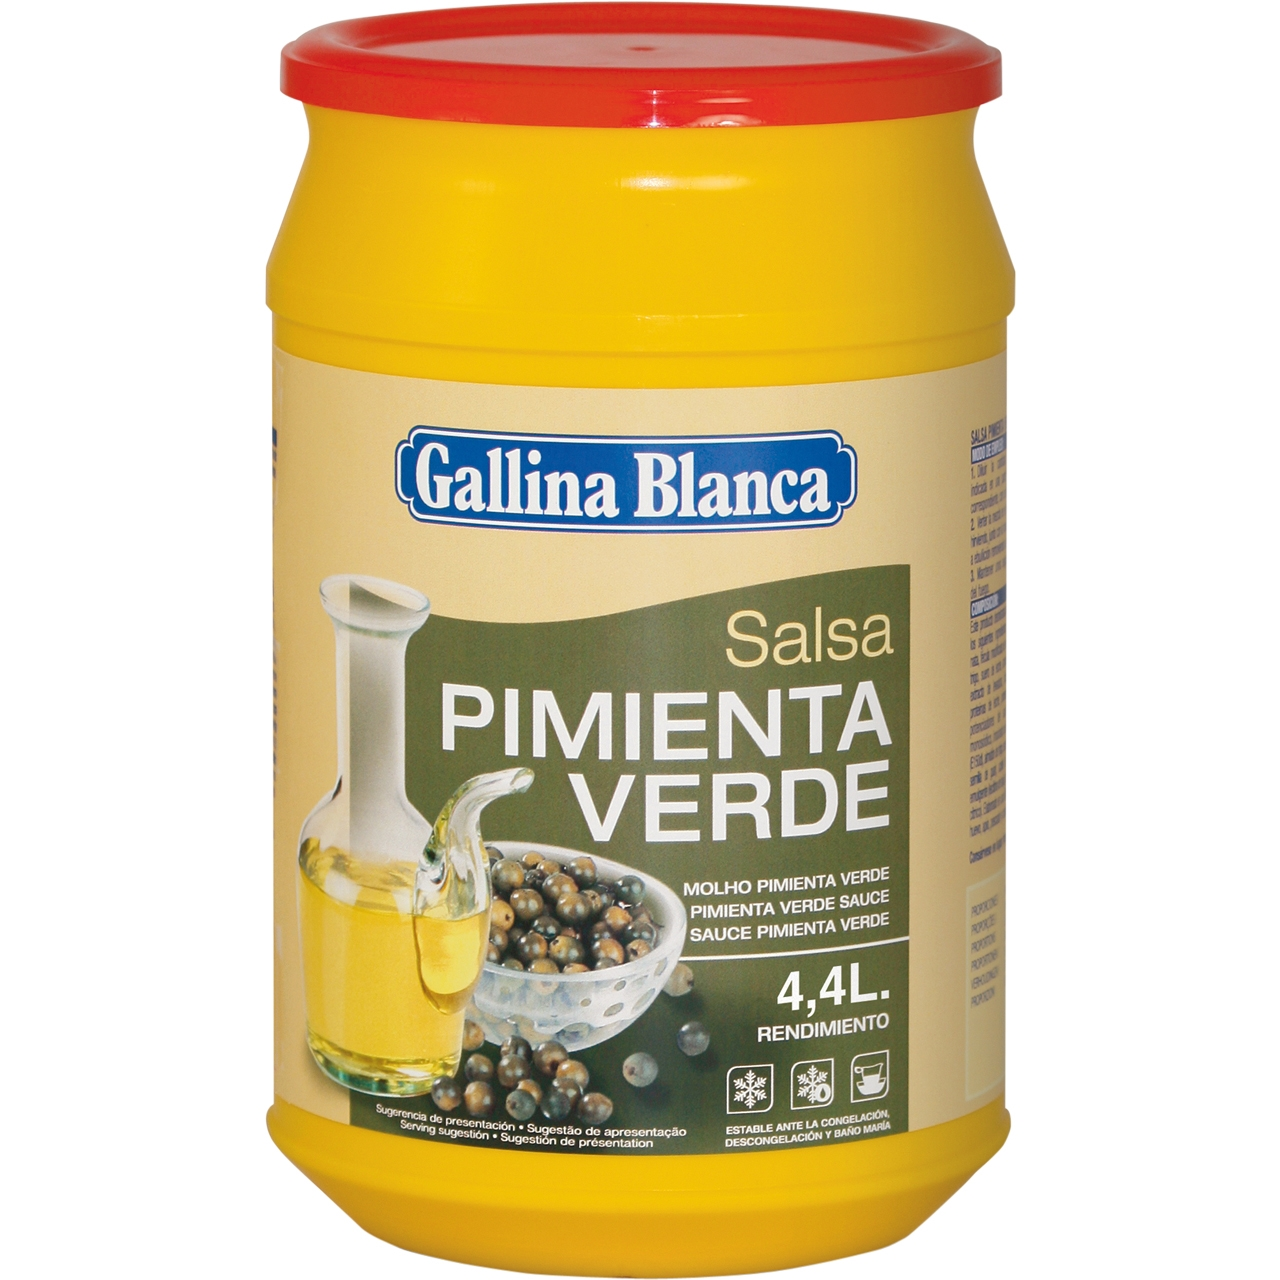 Salsa pimienta verde deshidratada 1kg. Gallina Blanca